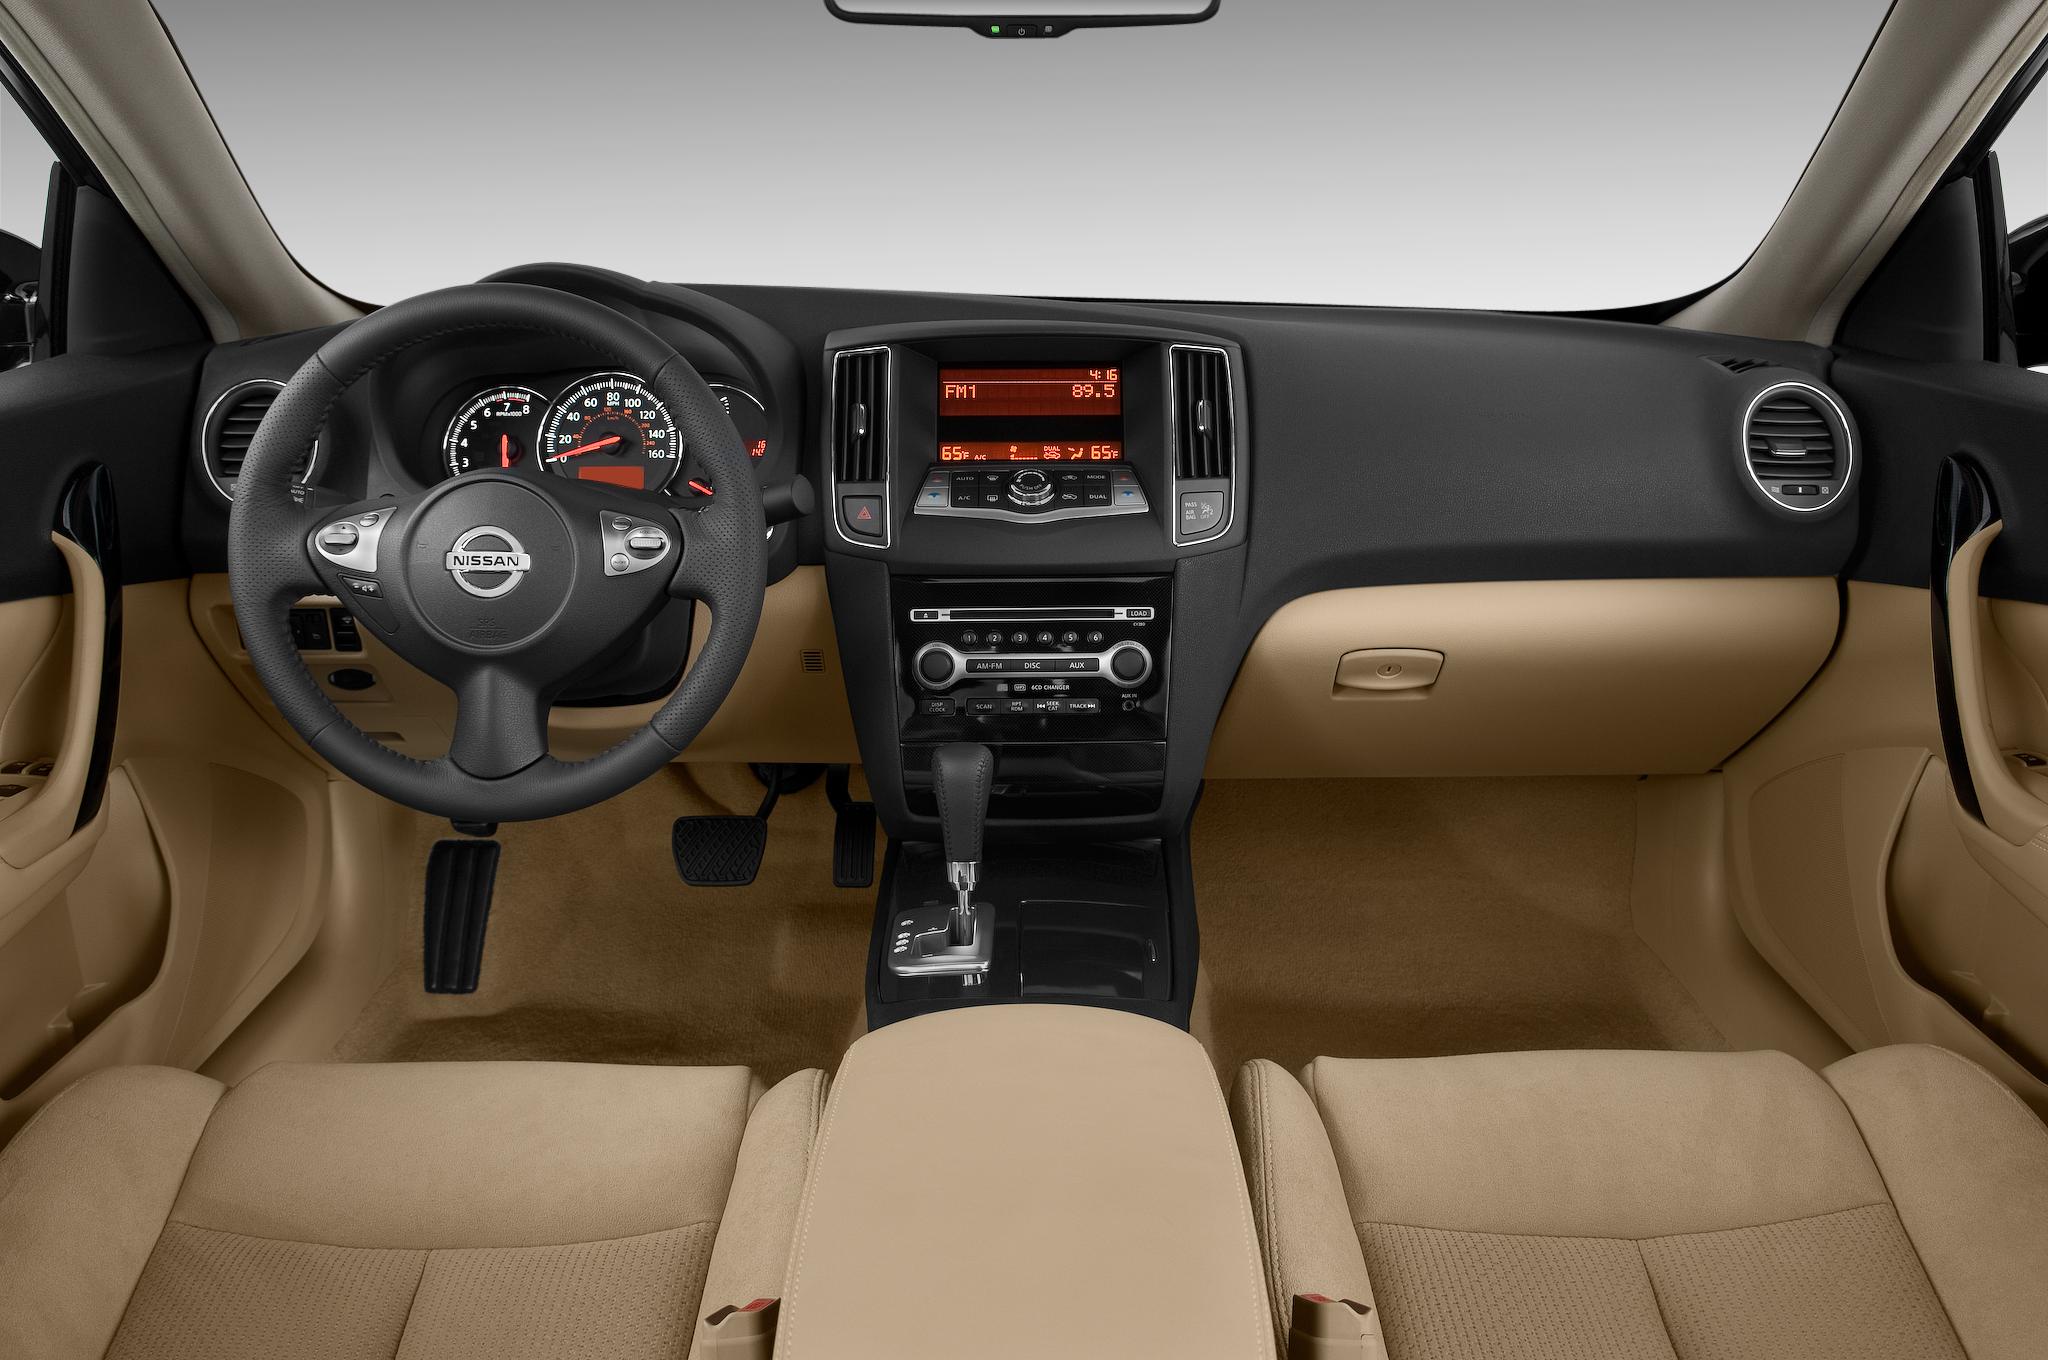 2010 Nissan Maxima Sv Review | Car Reviews 2018